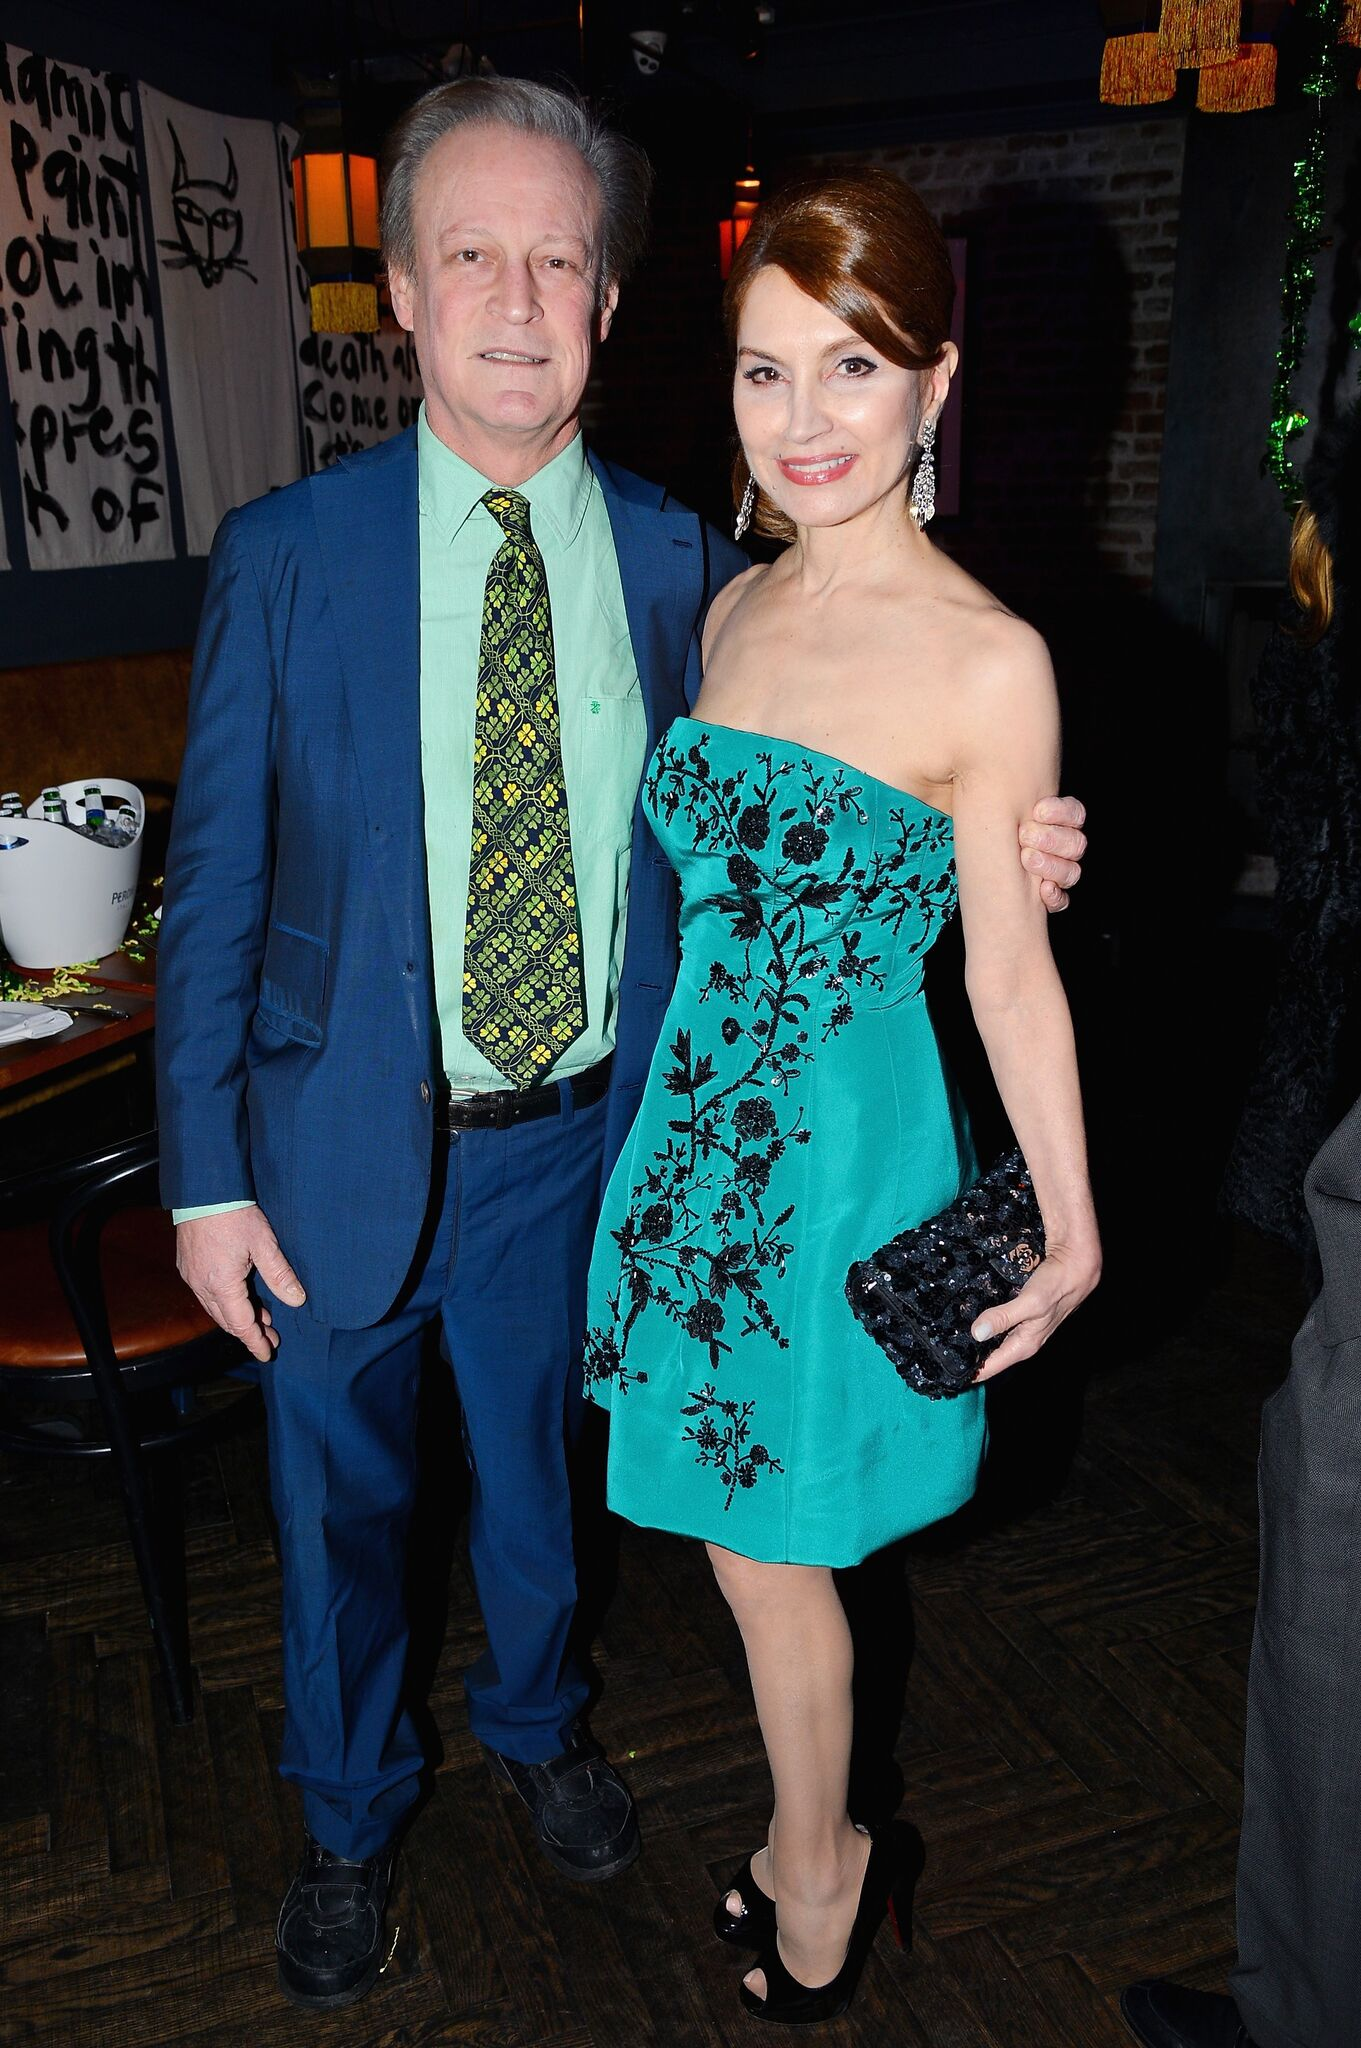 Philanthropist Jean Shafiroff Hosts Surprise St. Patrick's Day Dinner for Patrick McMullan